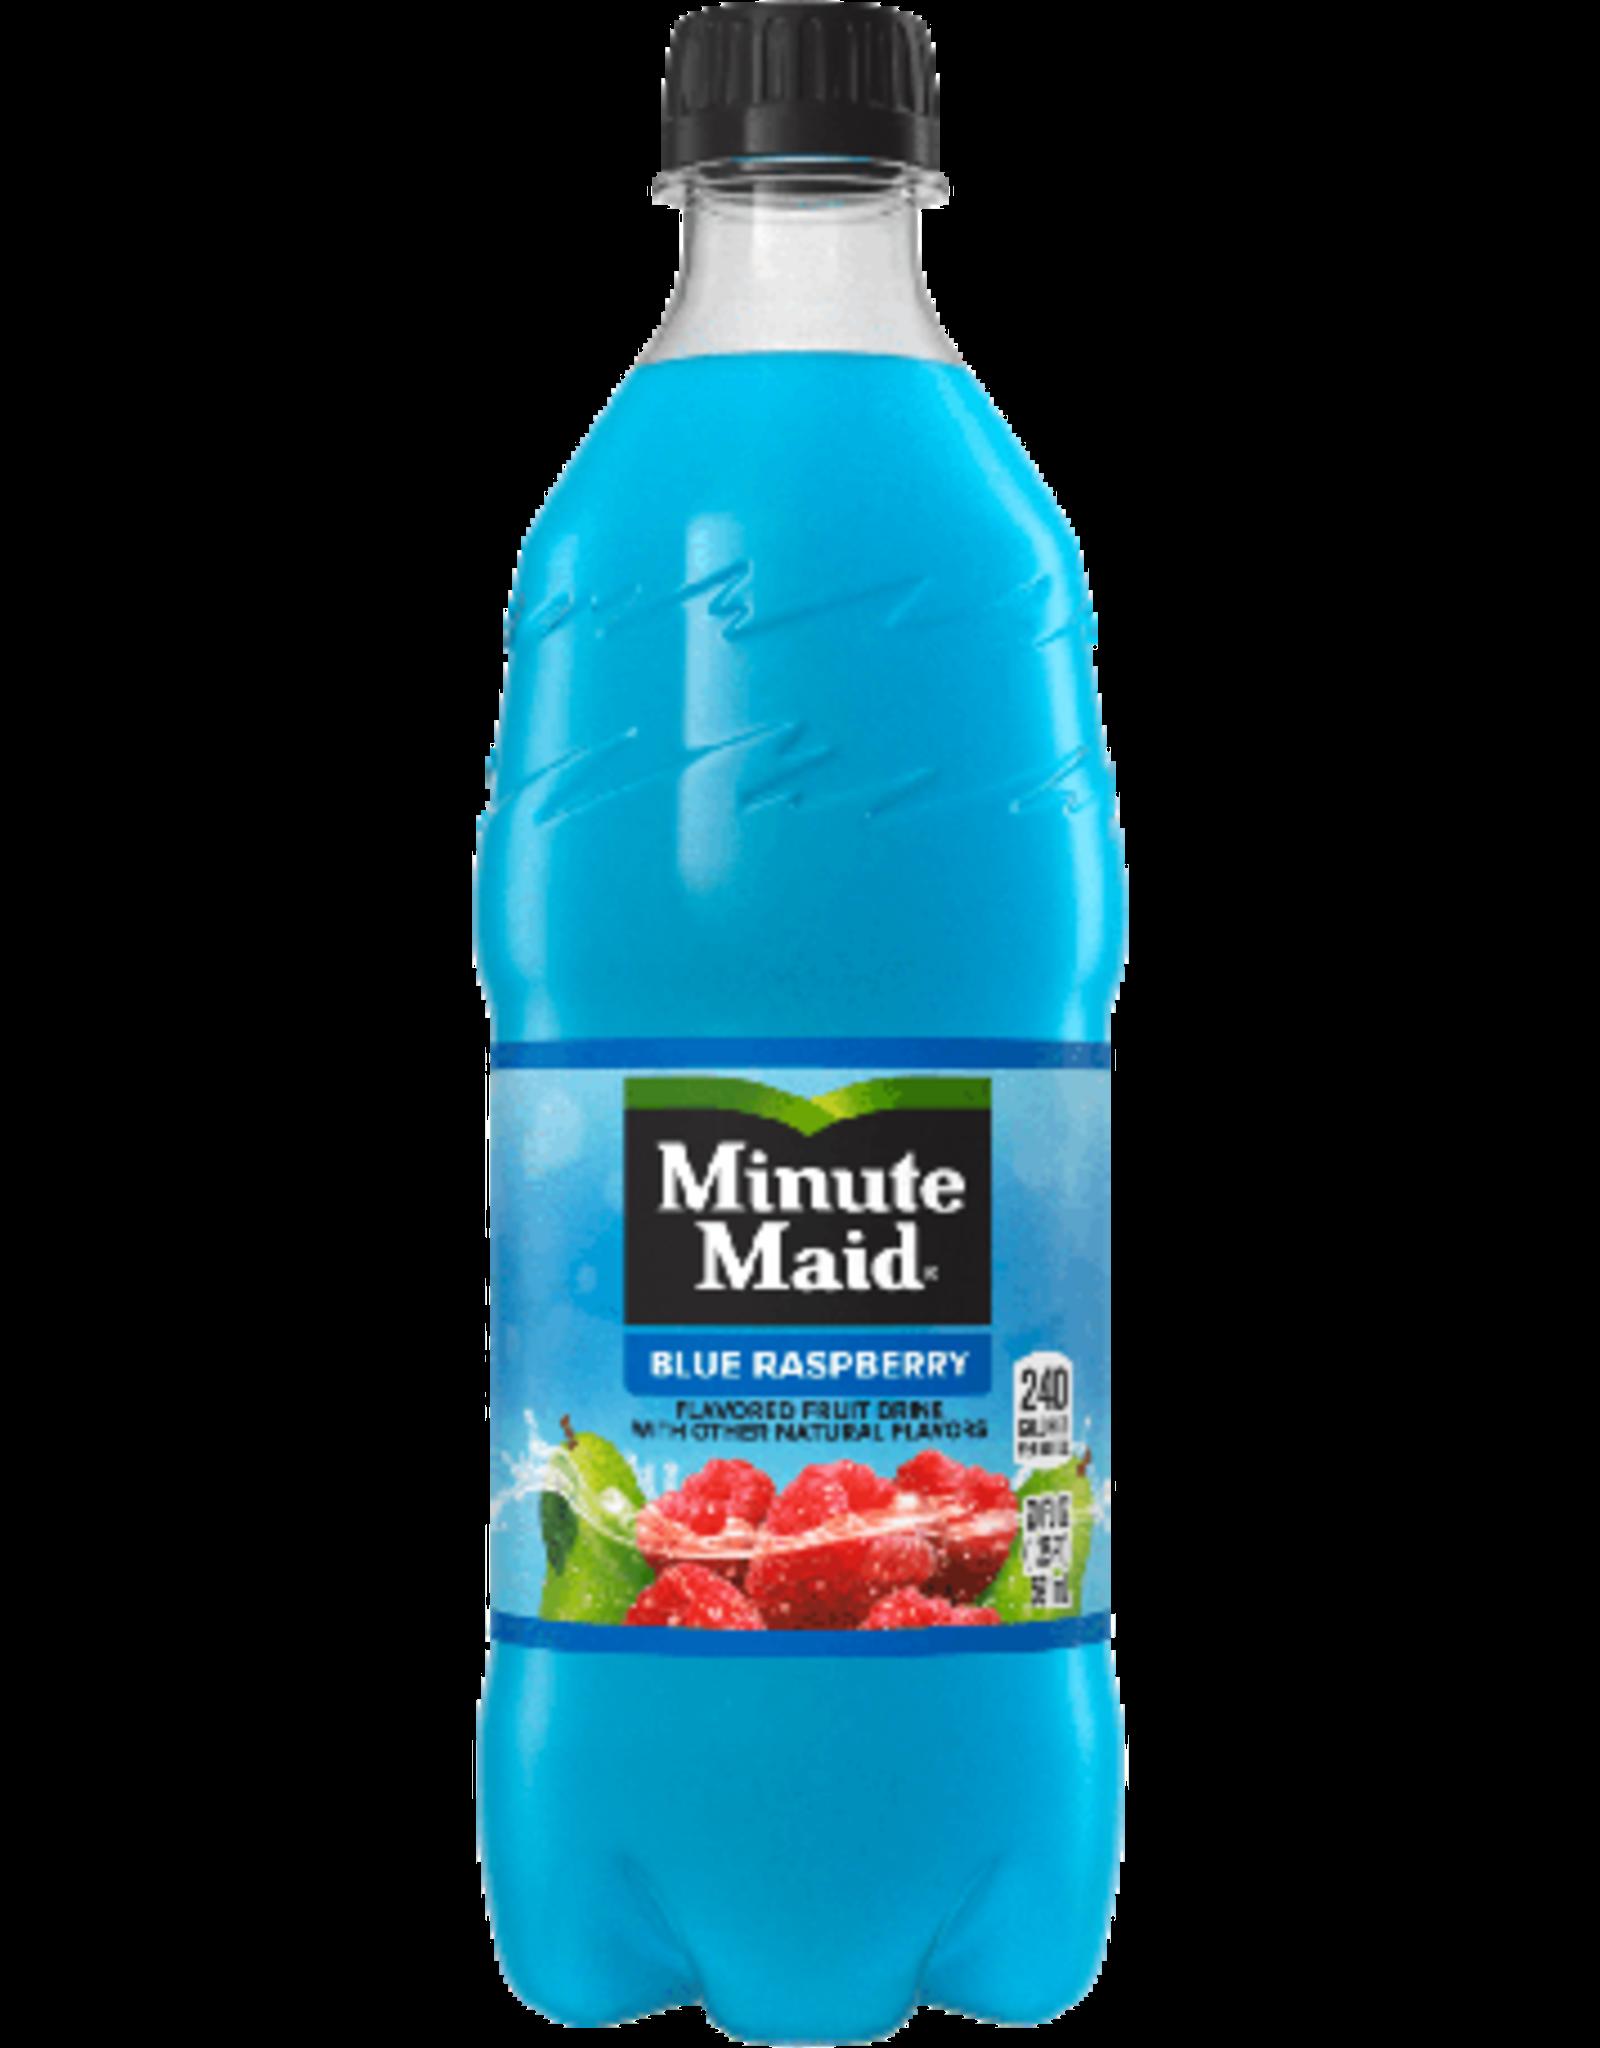 Minute Maid Blue Raspberry